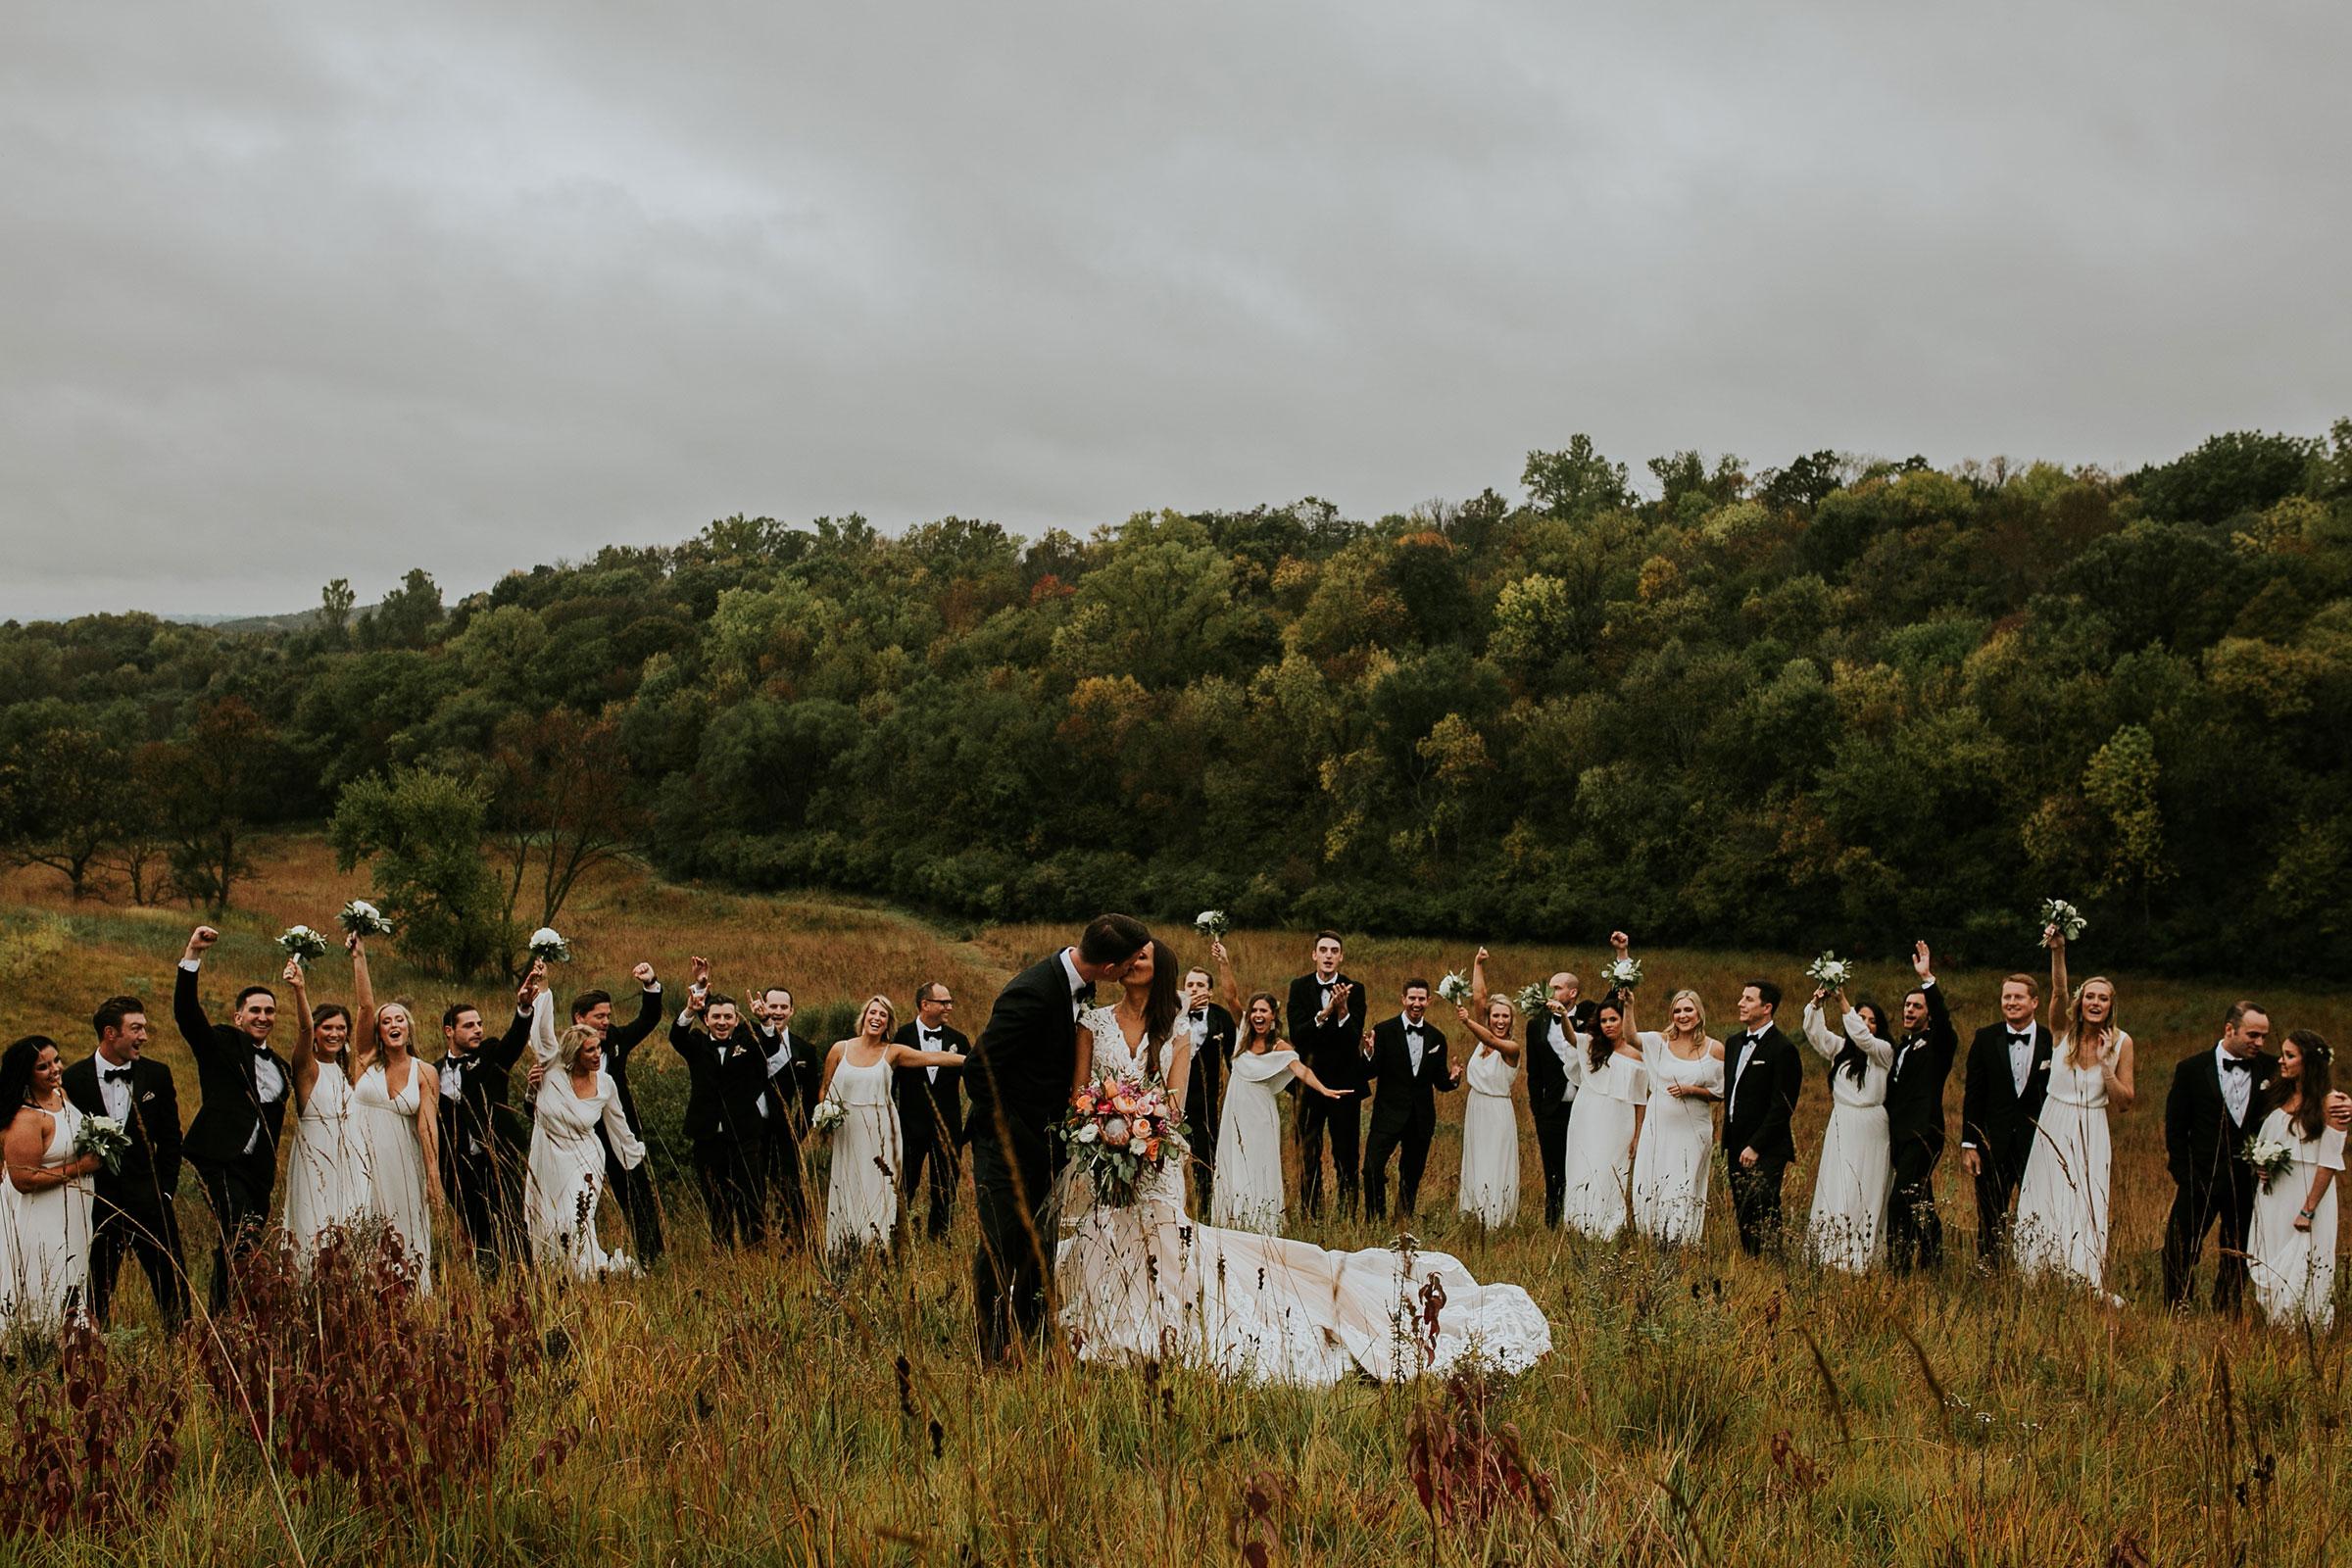 bride-groom-kissing-wedding-party-standing-around-on-hill-top-omaha-nebraska-raelyn-ramey-photography.jpg